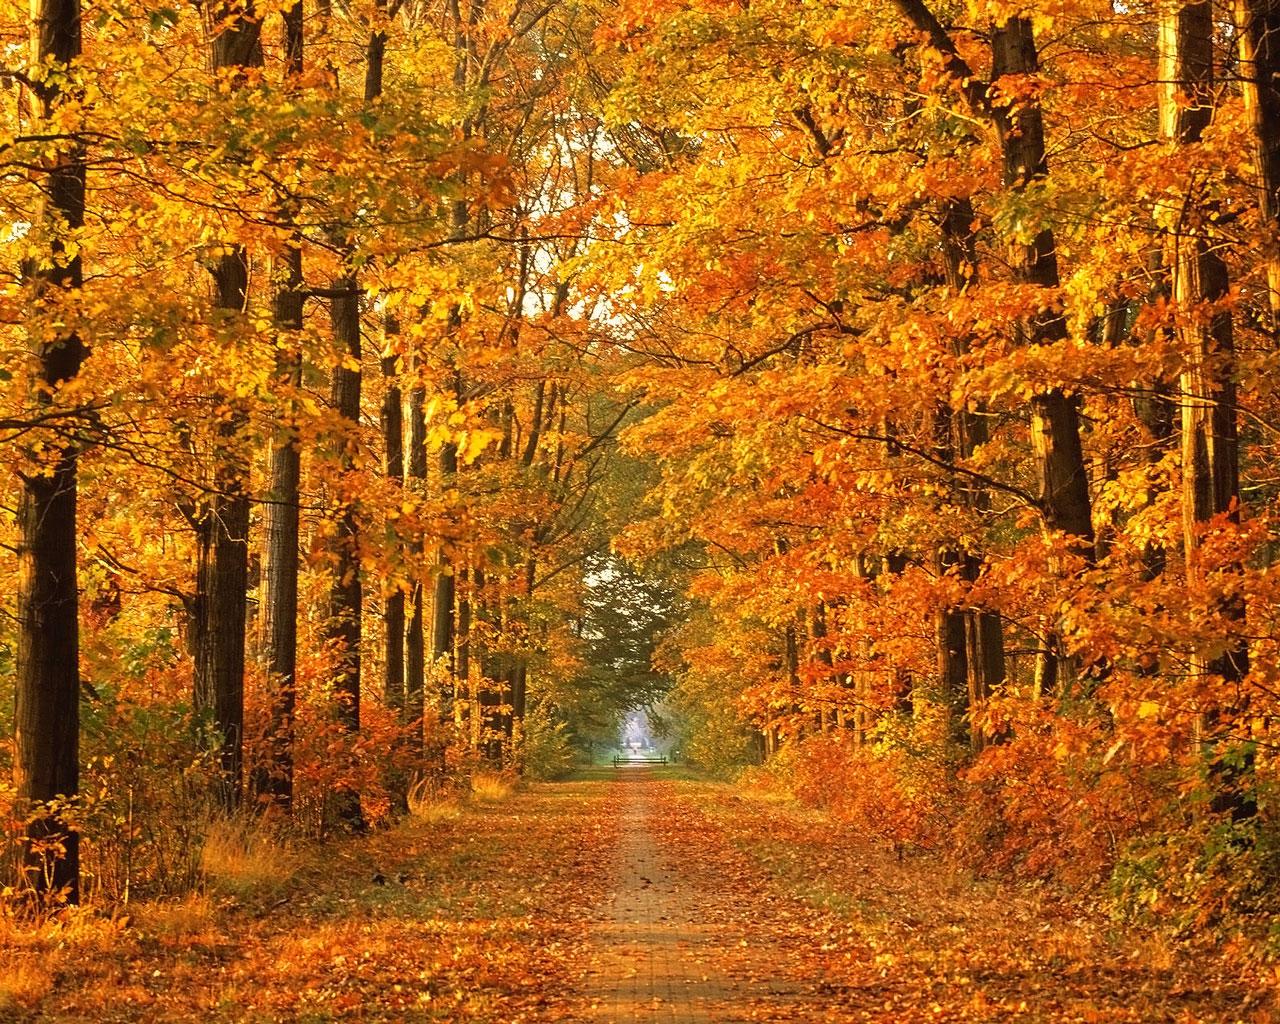 http://1.bp.blogspot.com/-u7Xgq-dDKi0/UGBpqBoyllI/AAAAAAAAAEs/OJd1sfTPc9I/s1600/autumn-wallpaper-2.jpg